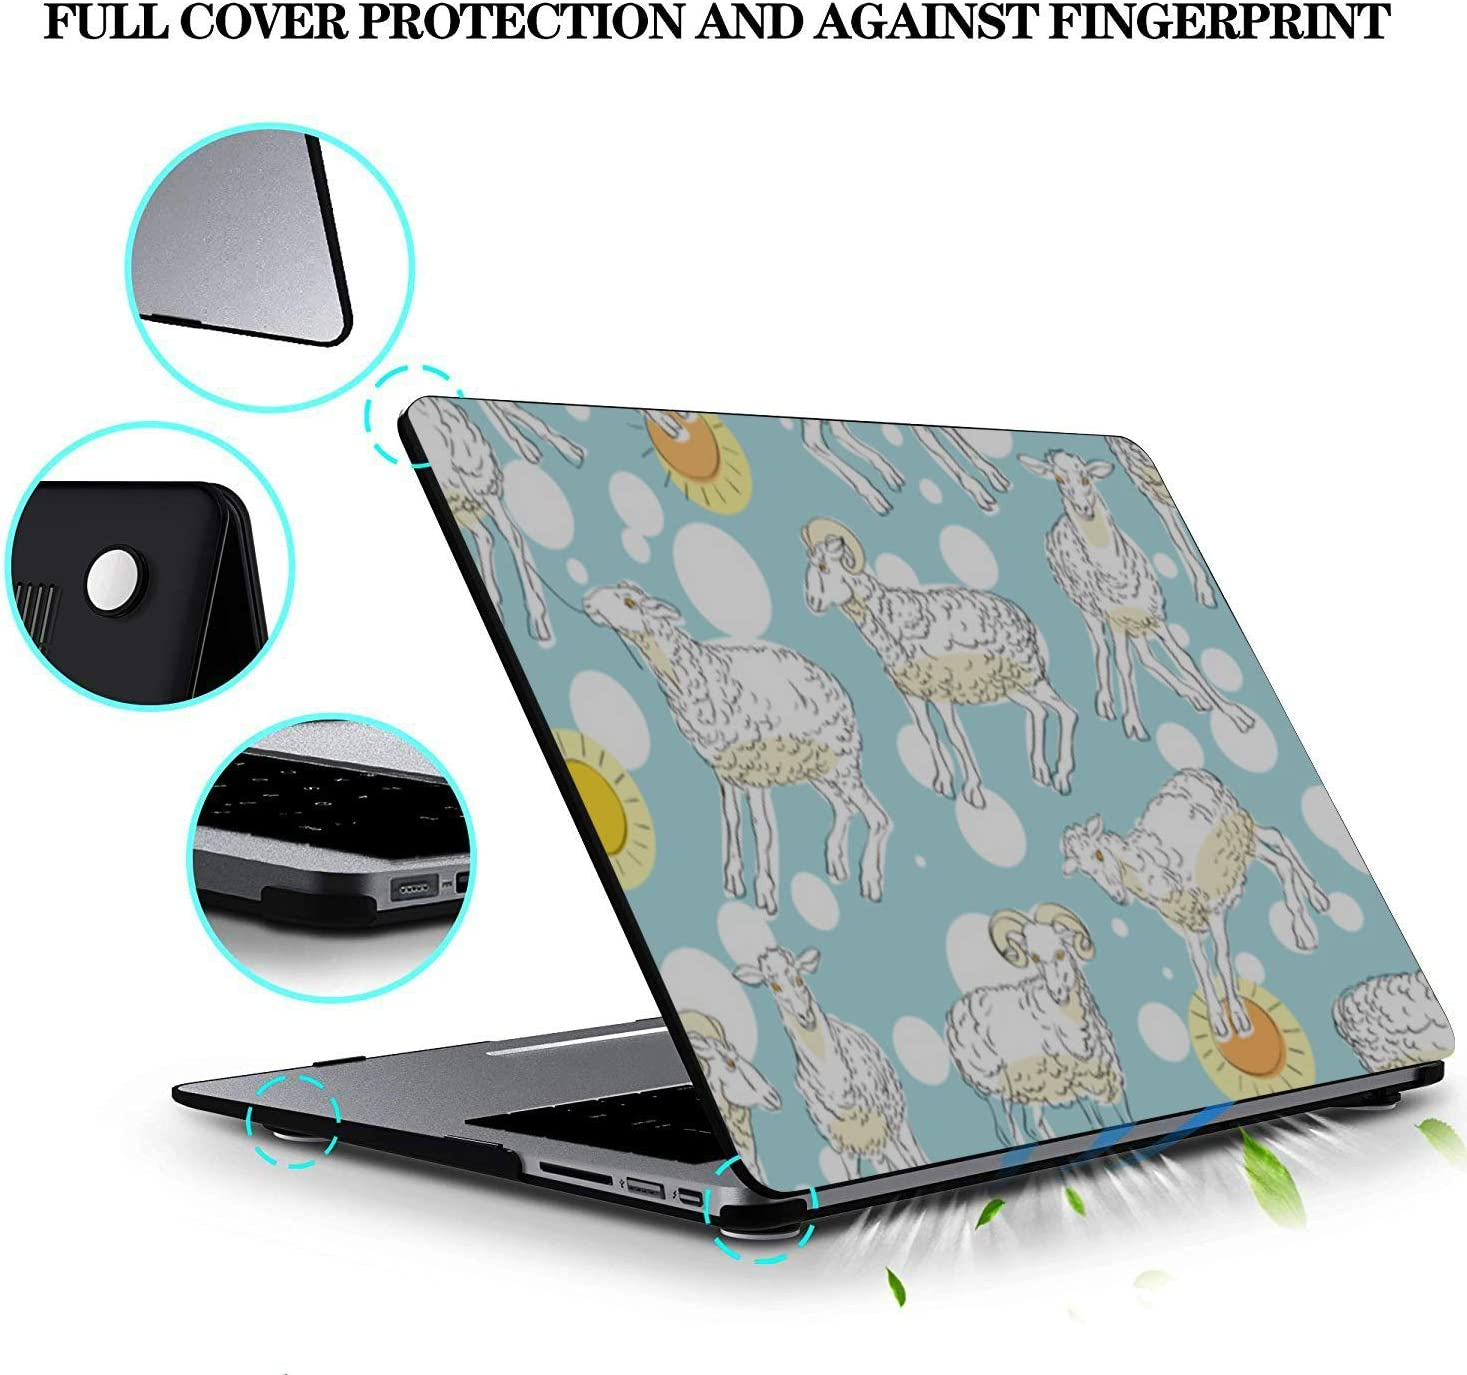 MacBook Air Laptop Case Sheep Retro Wild Animal Naturel Plastic Hard Shell Compatible Mac Air 11 Pro 13 15 MacBook Pro Accessories Protection for MacBook 2016-2019 Version